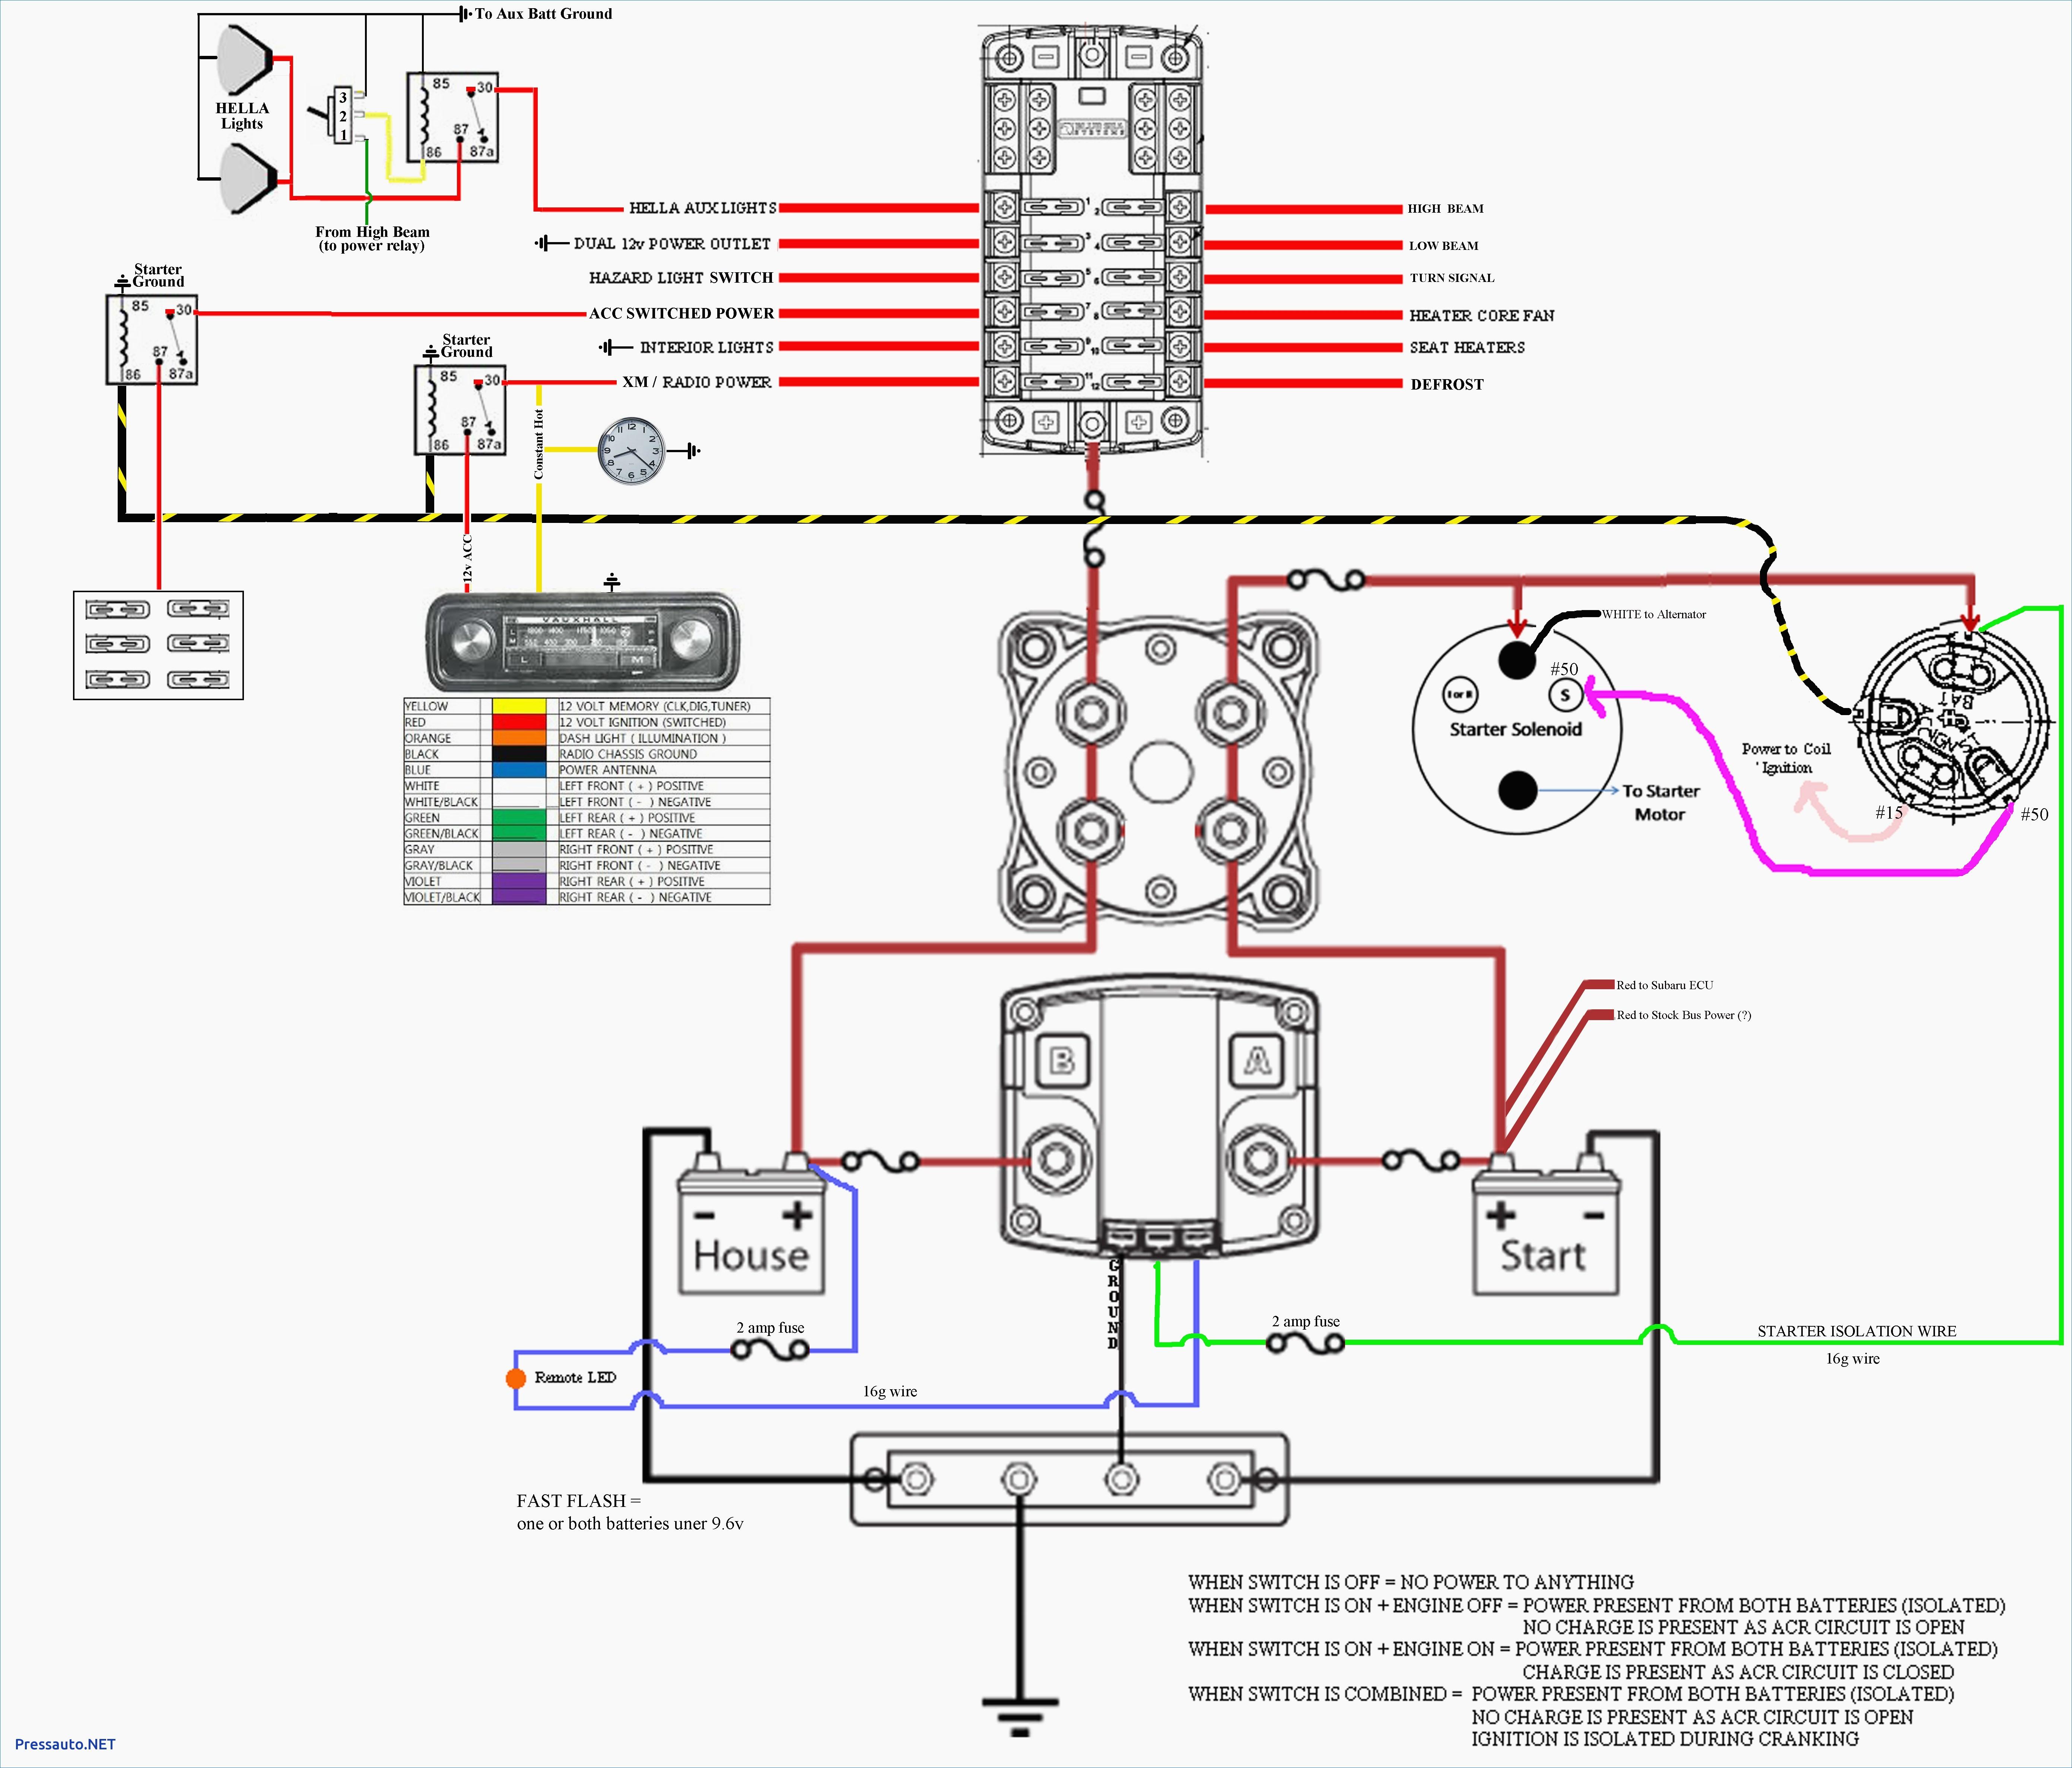 Boat Battery Wiring Diagram Marine Power Wiring Diagram Wiring Diagram Of Boat Battery Wiring Diagram